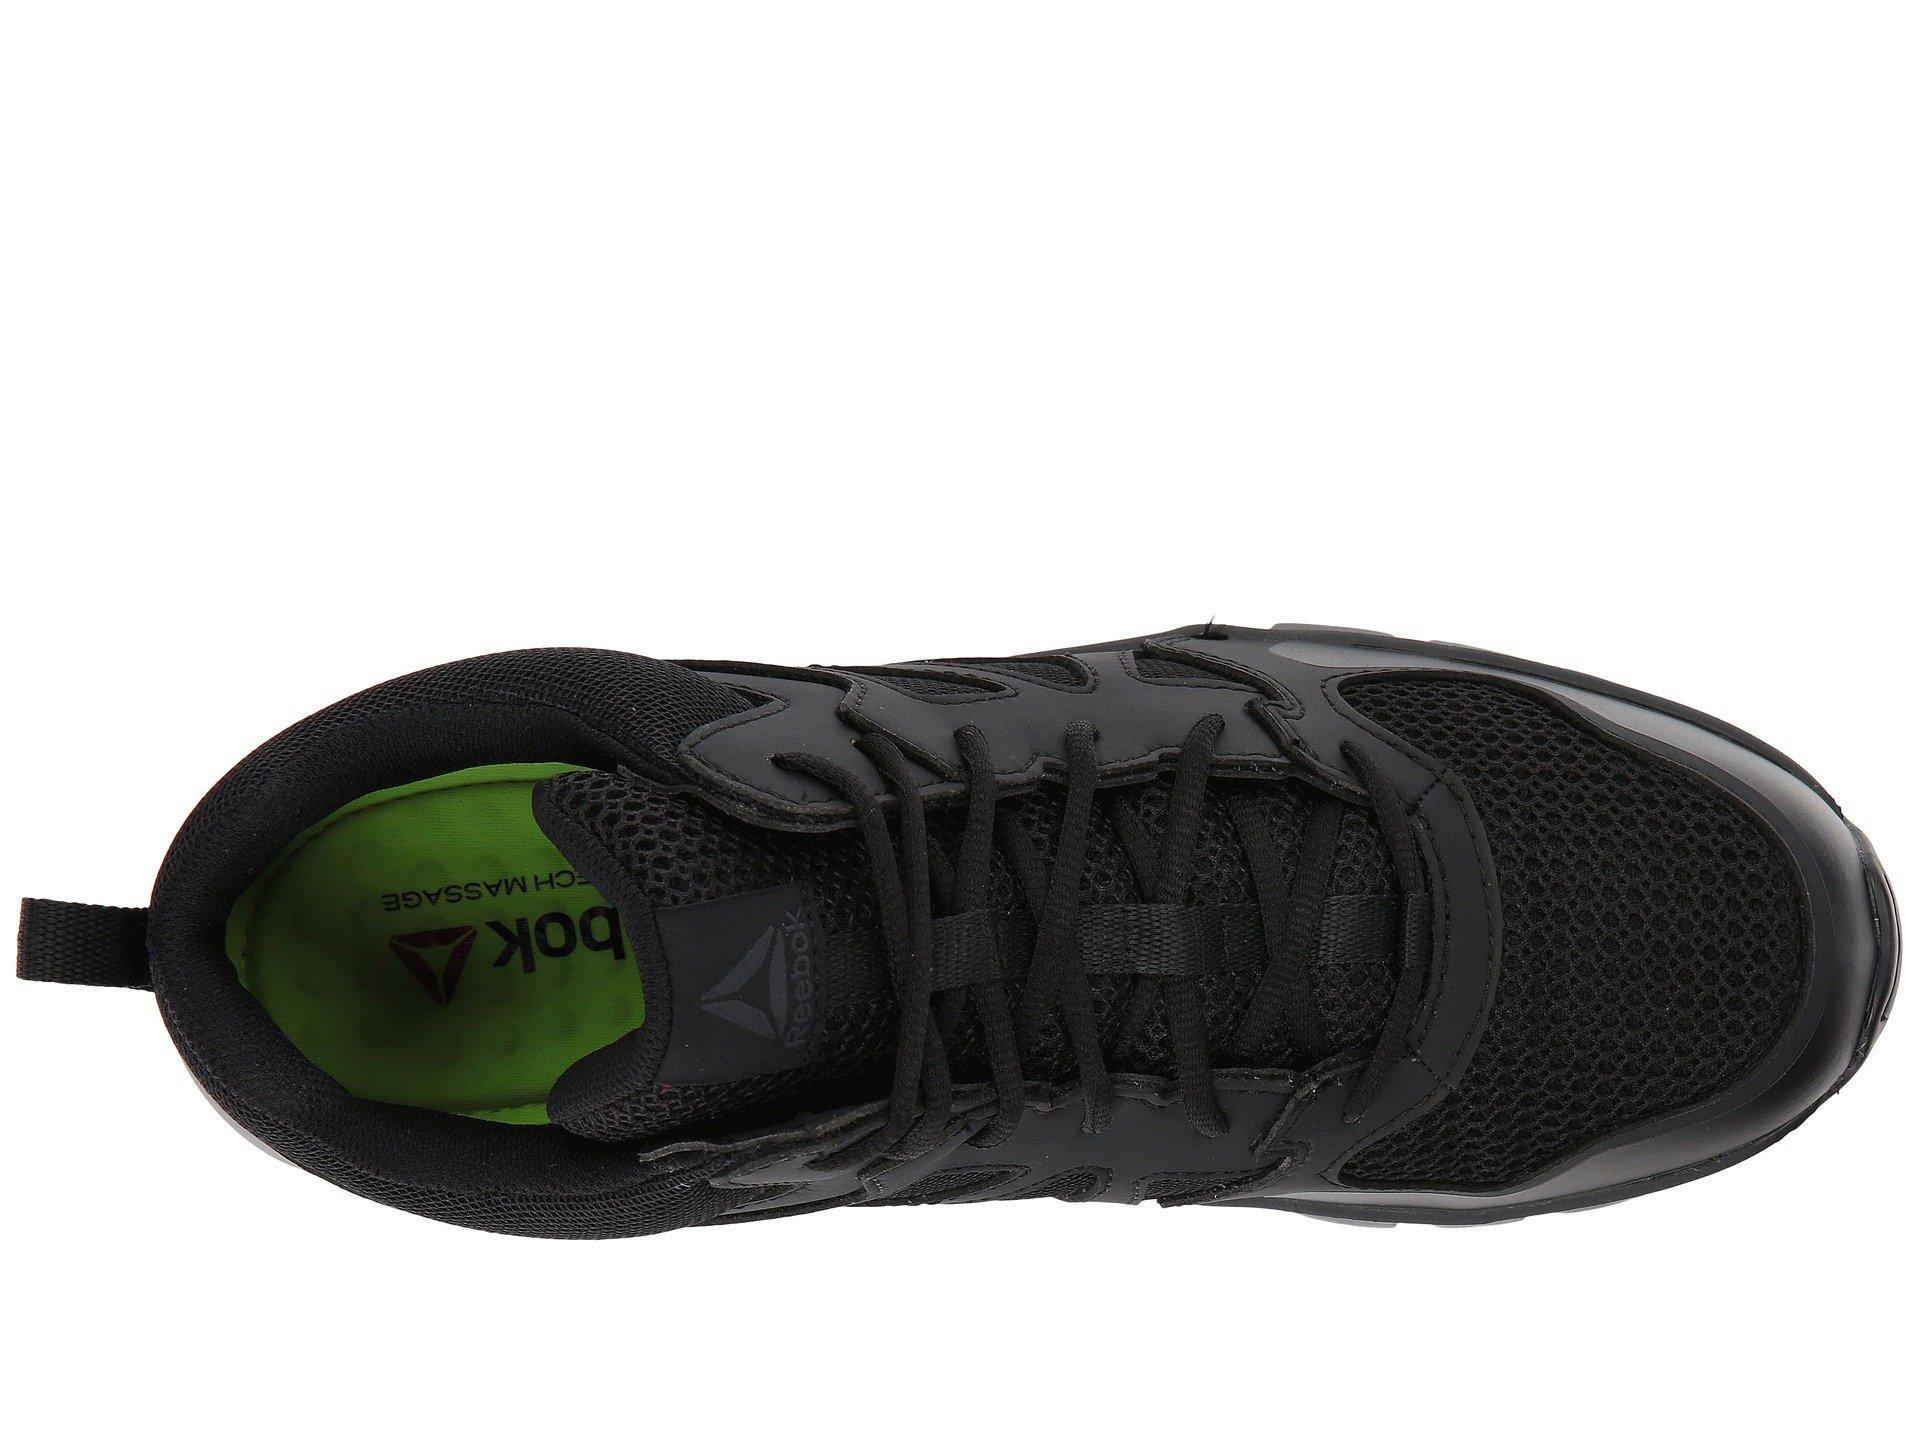 5931a982307807 Reebok - Black Sublite Cushion Tactical (coyote) Men s Boots for Men -  Lyst. View fullscreen